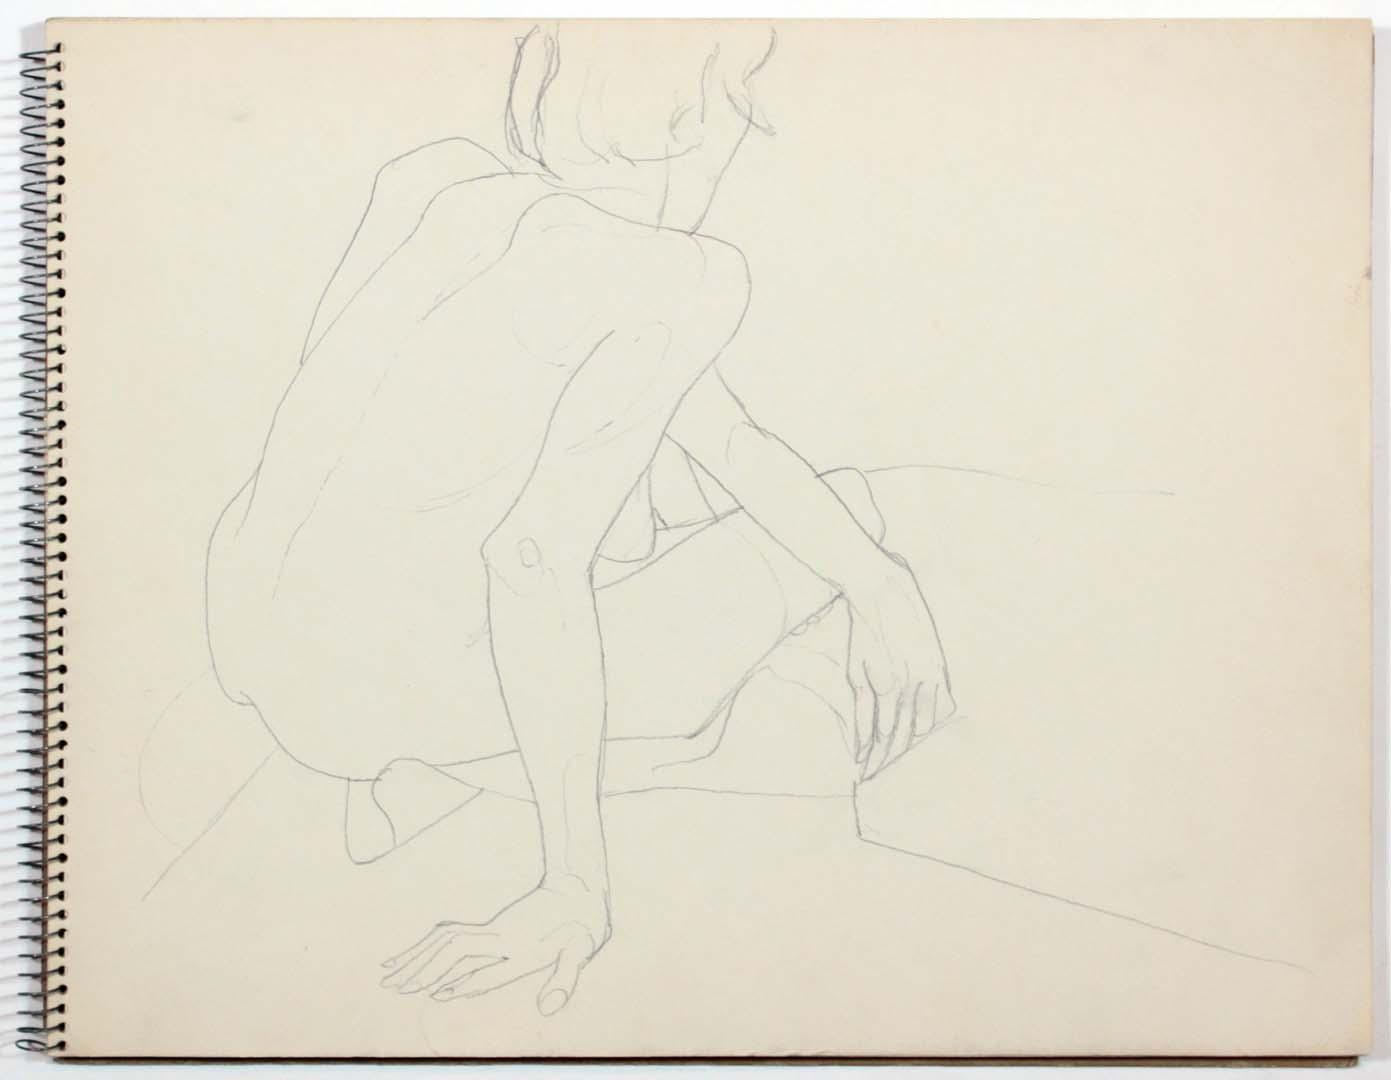 1961 Untitled Graphite 11 x 14